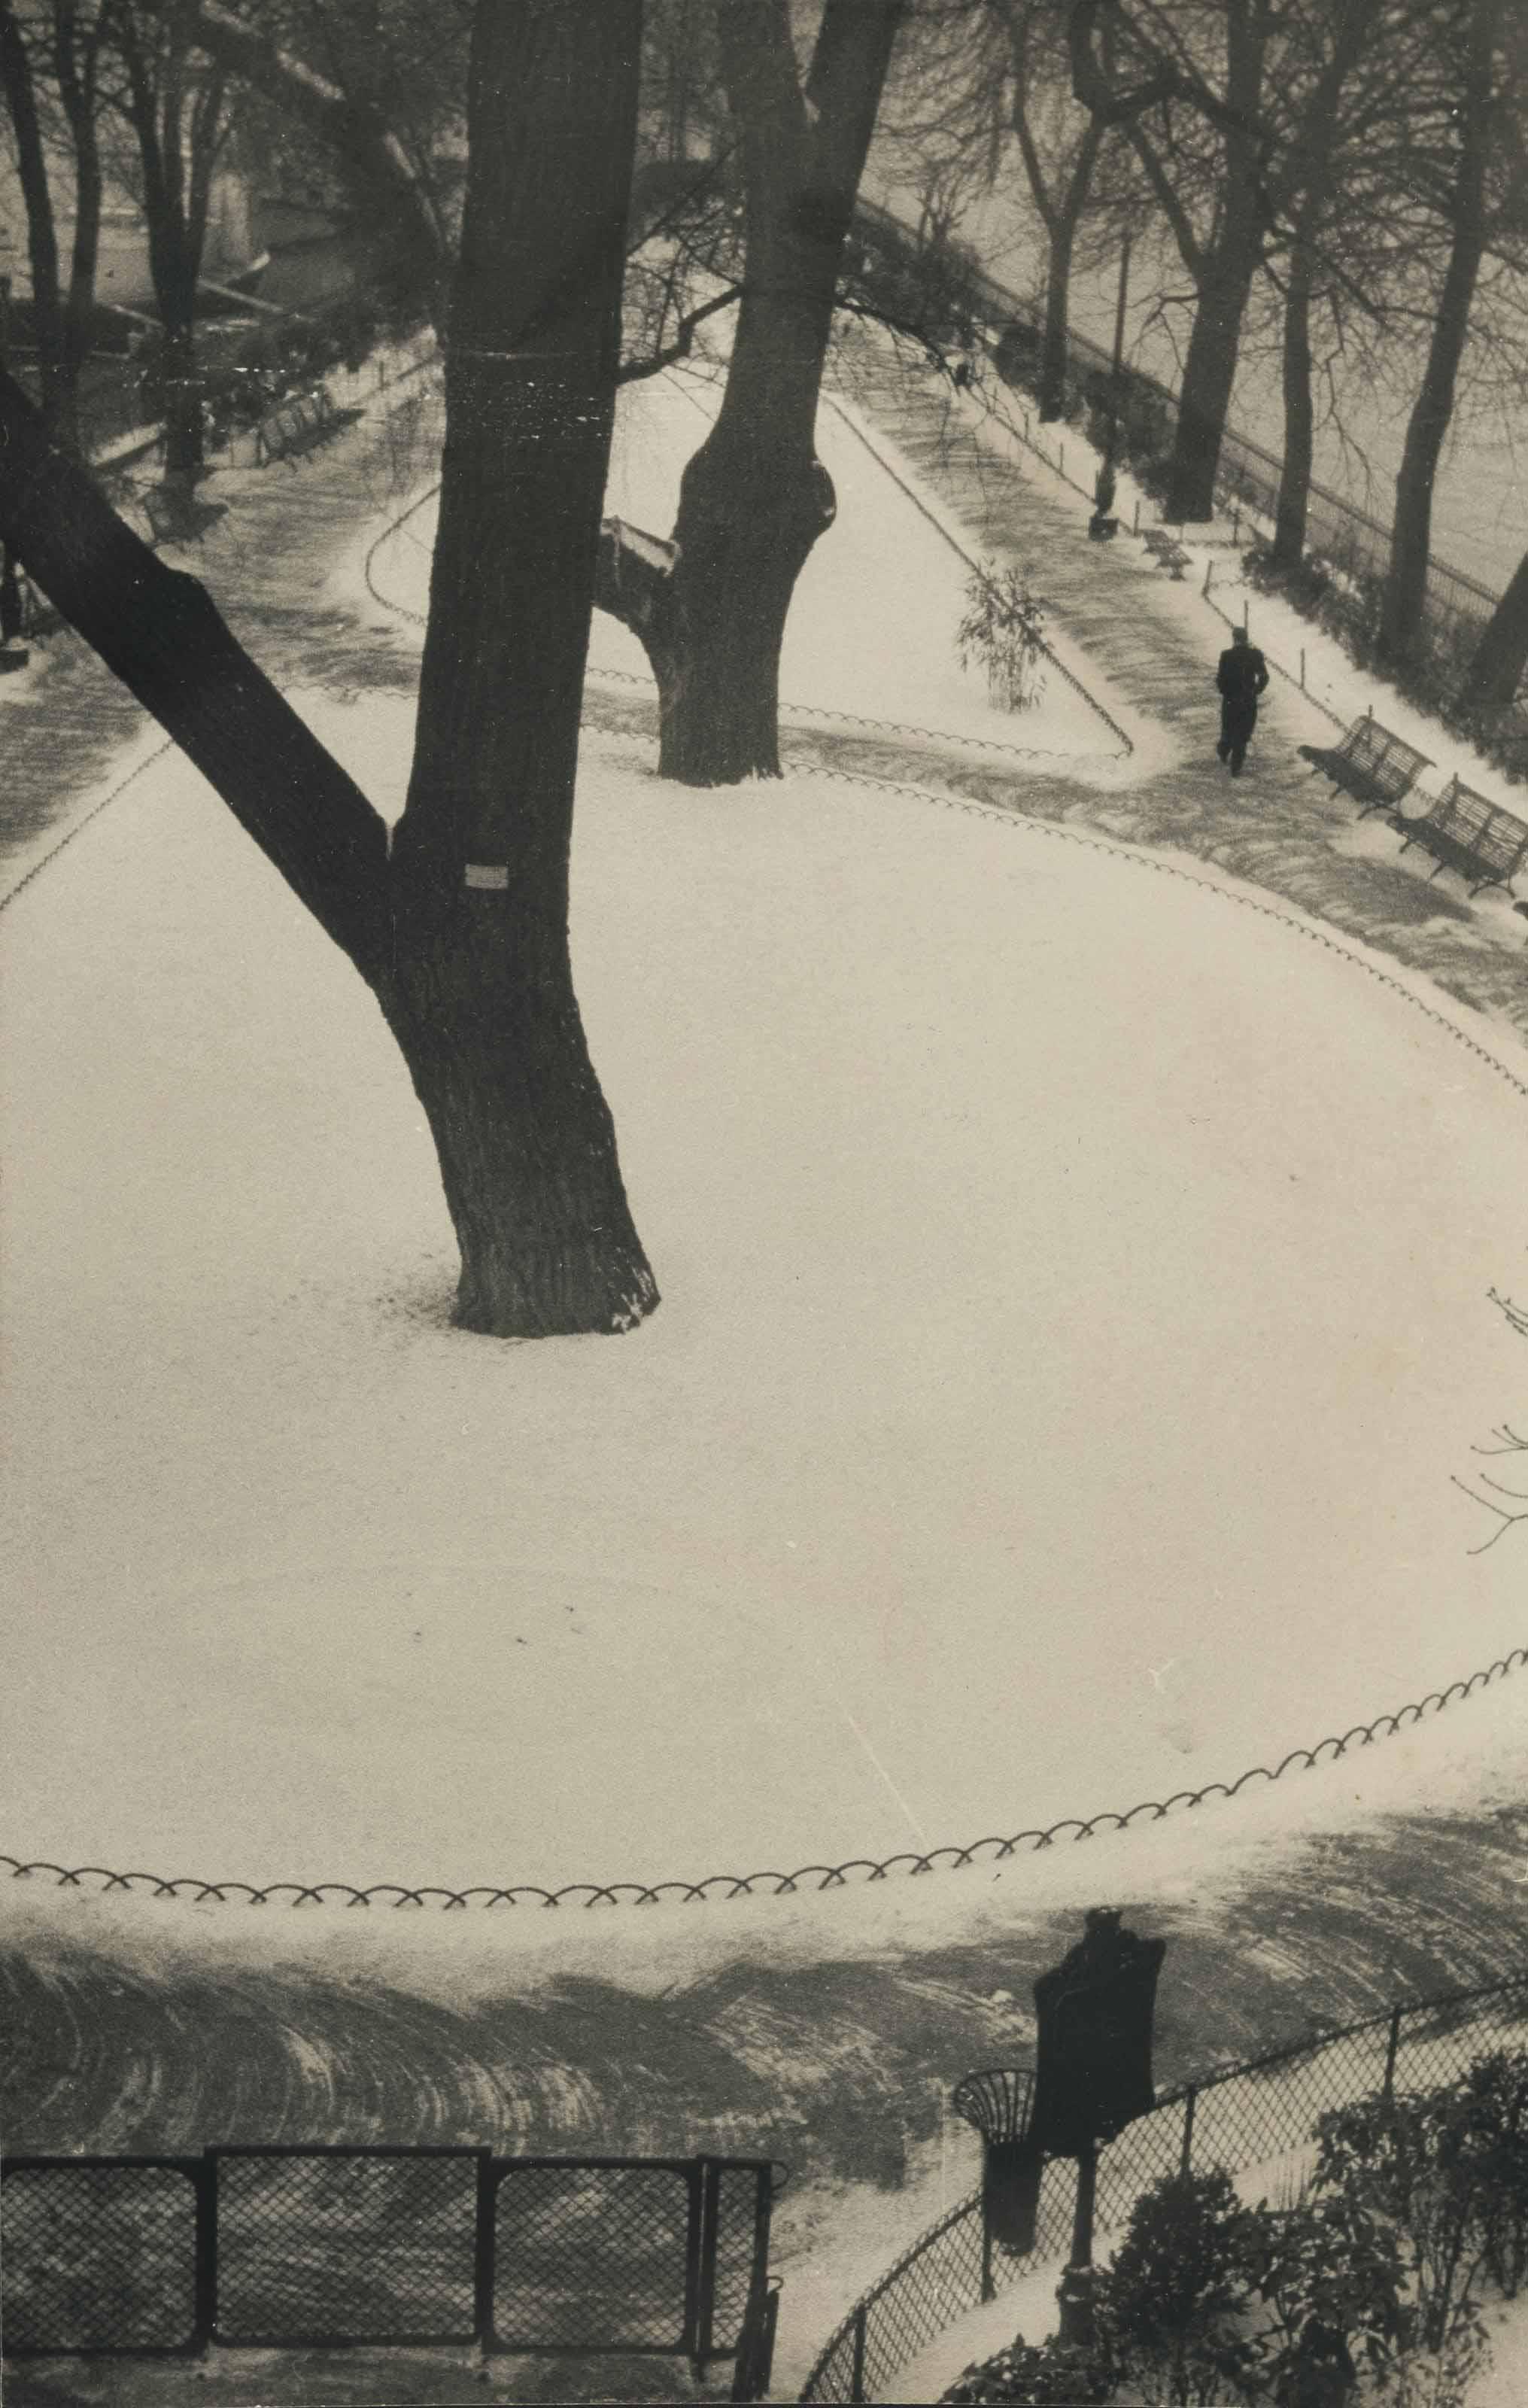 Vert-Galant en hiver, 1929